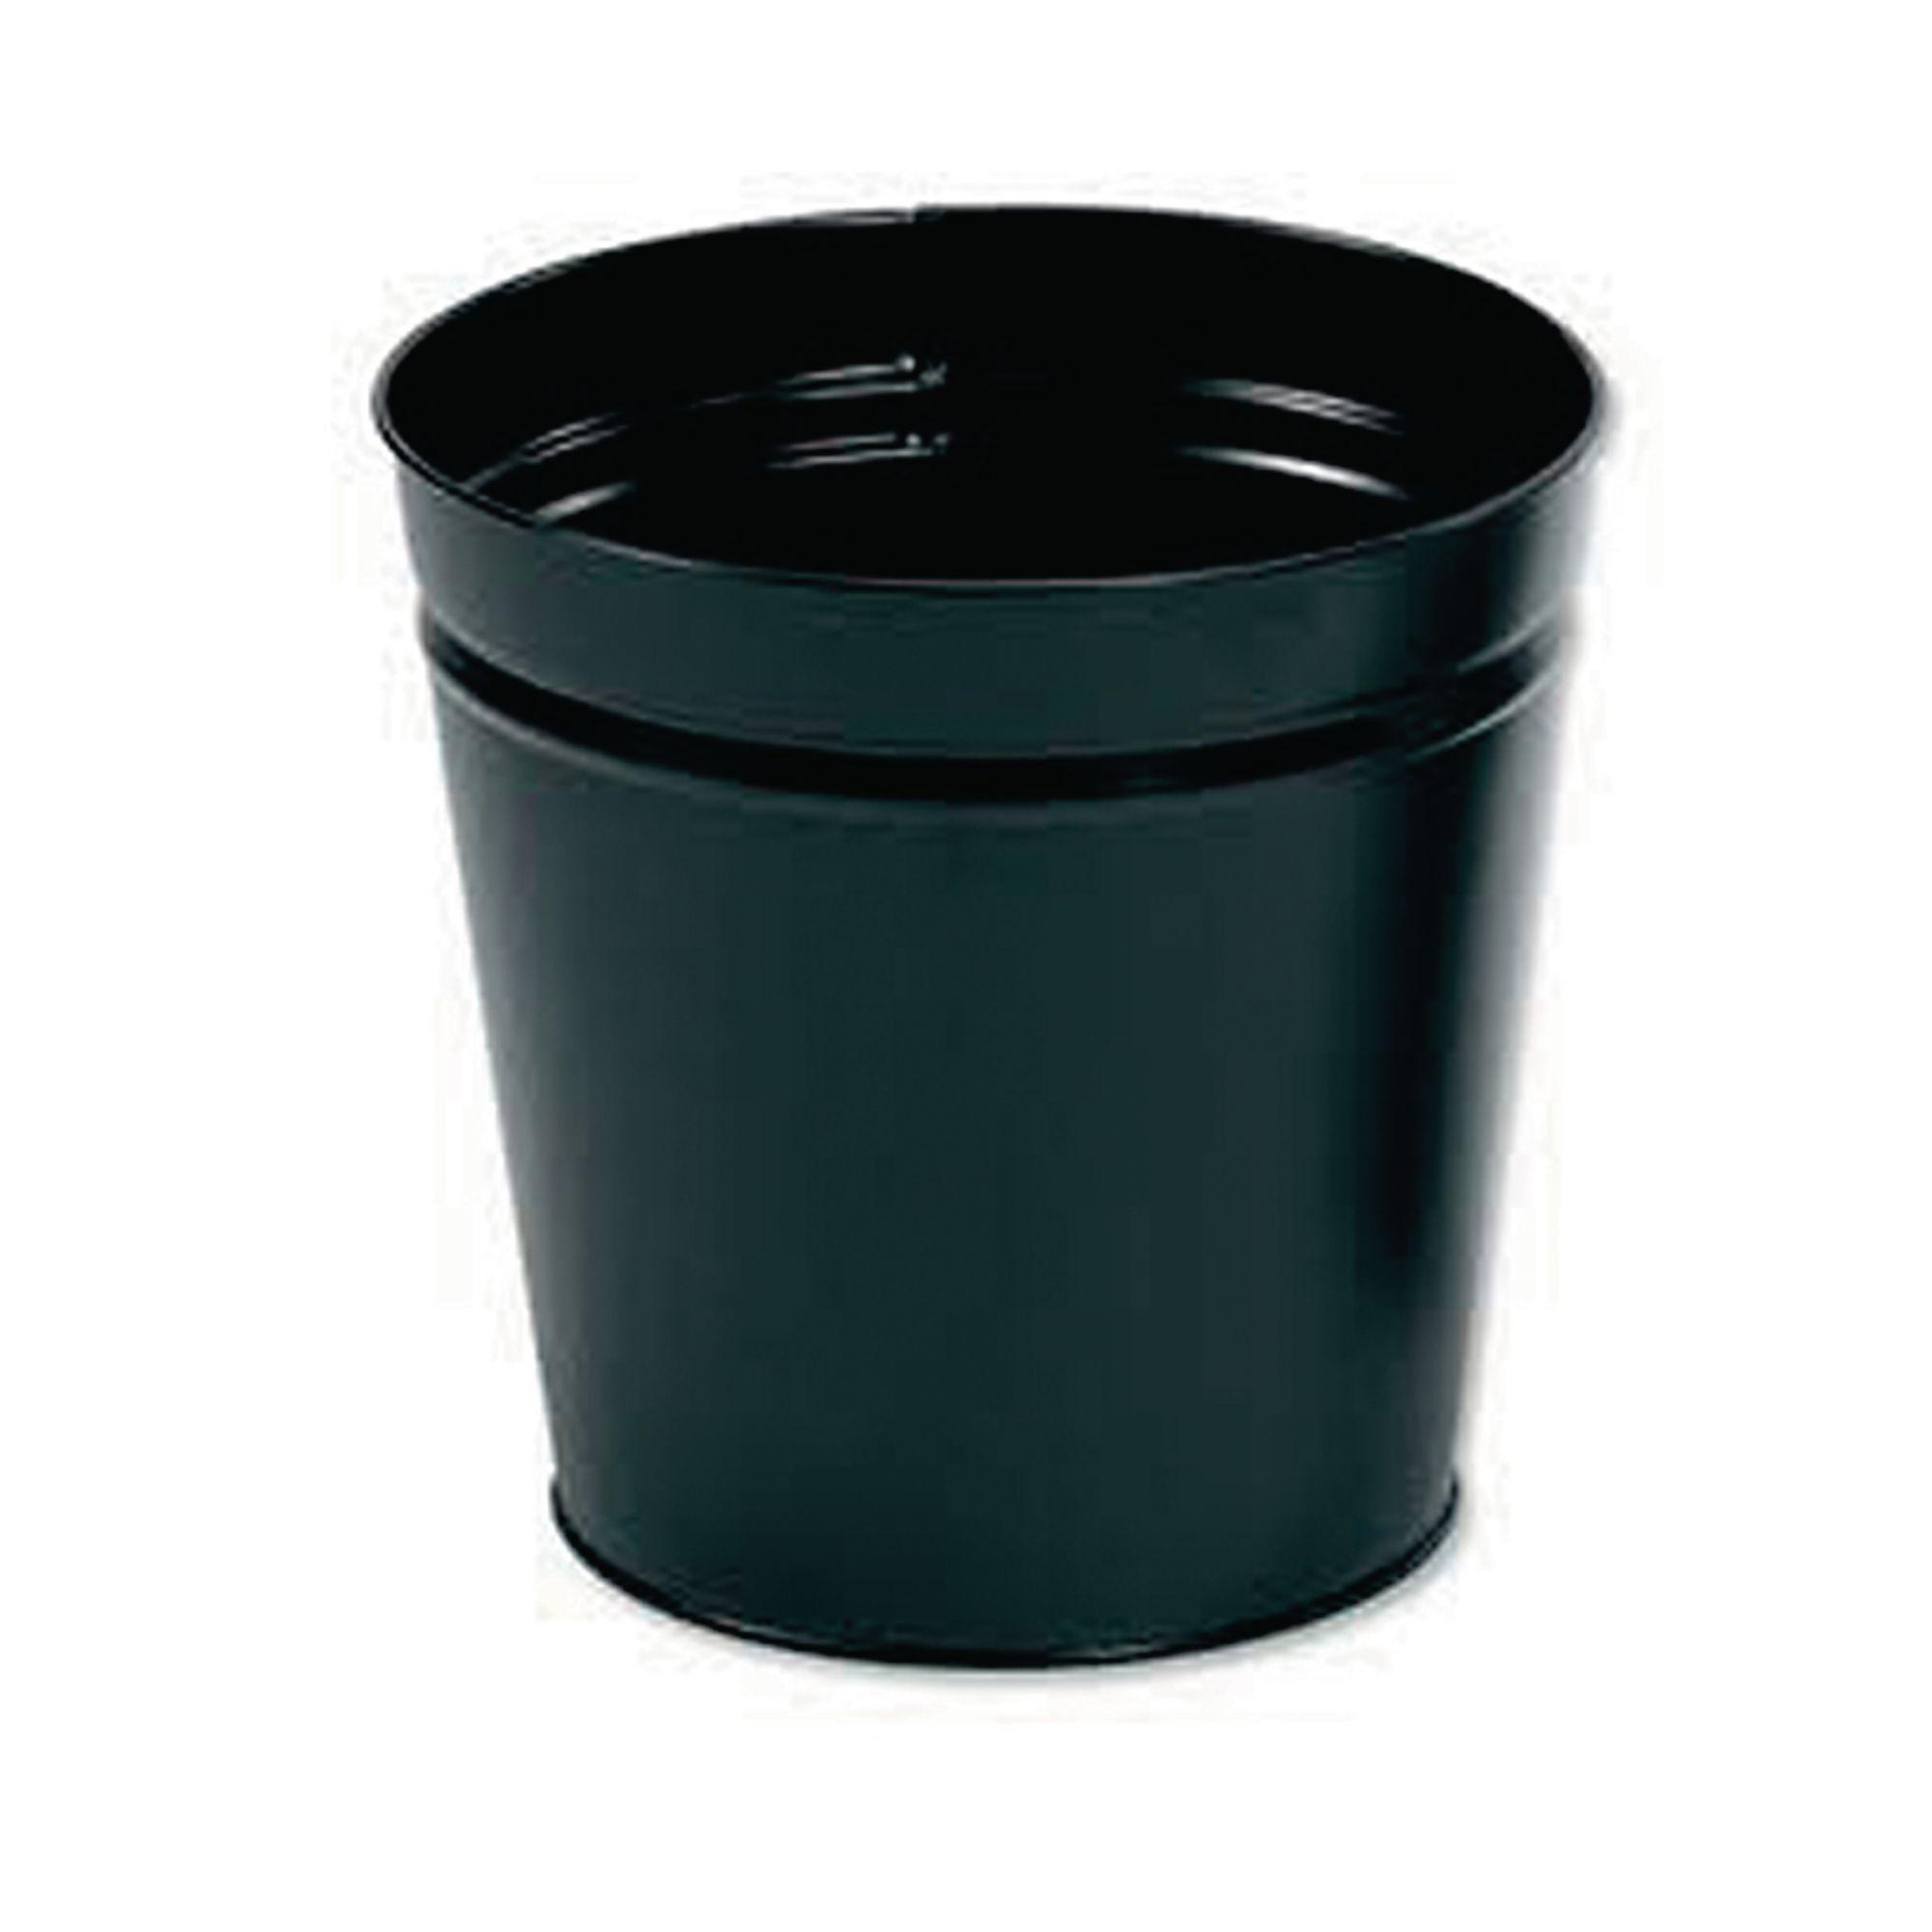 Metal Waste Paper Bin 15L Black